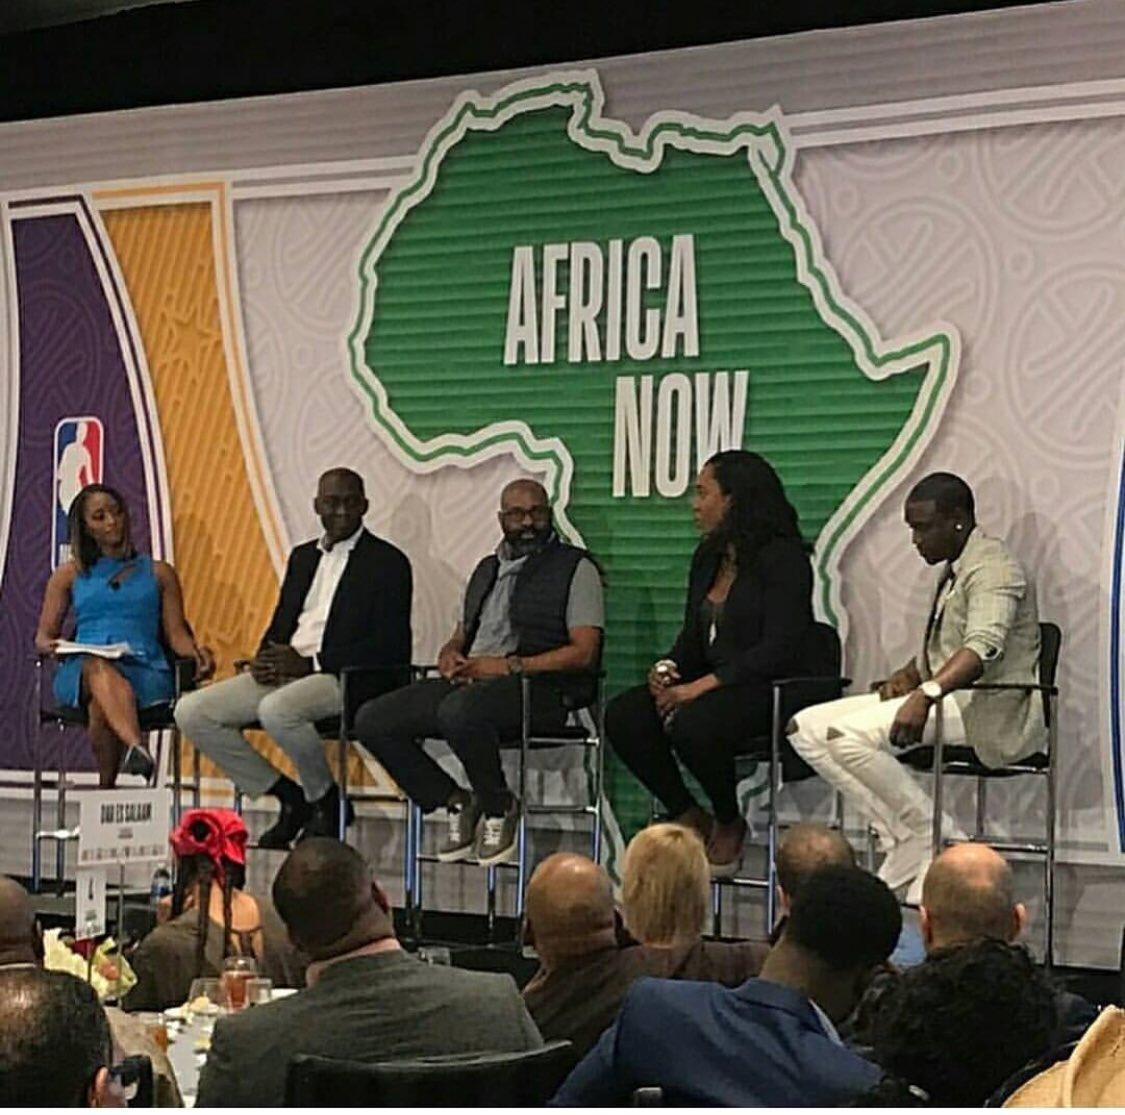 #NBAAllStar2018 @nba @NBAAfrica https://t.co/9aY2FQRSio